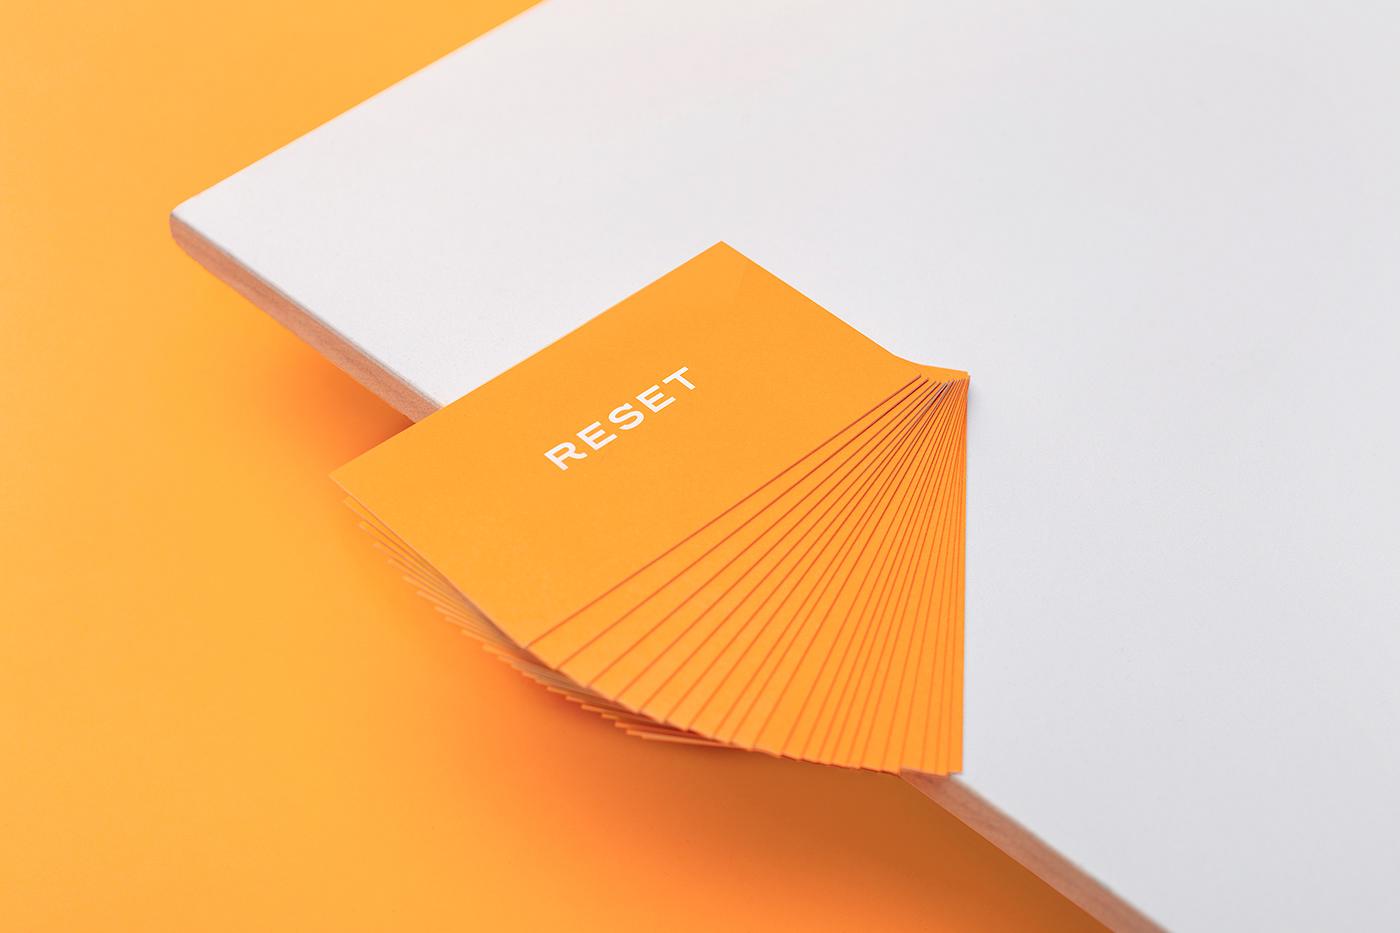 Image may contain: orange